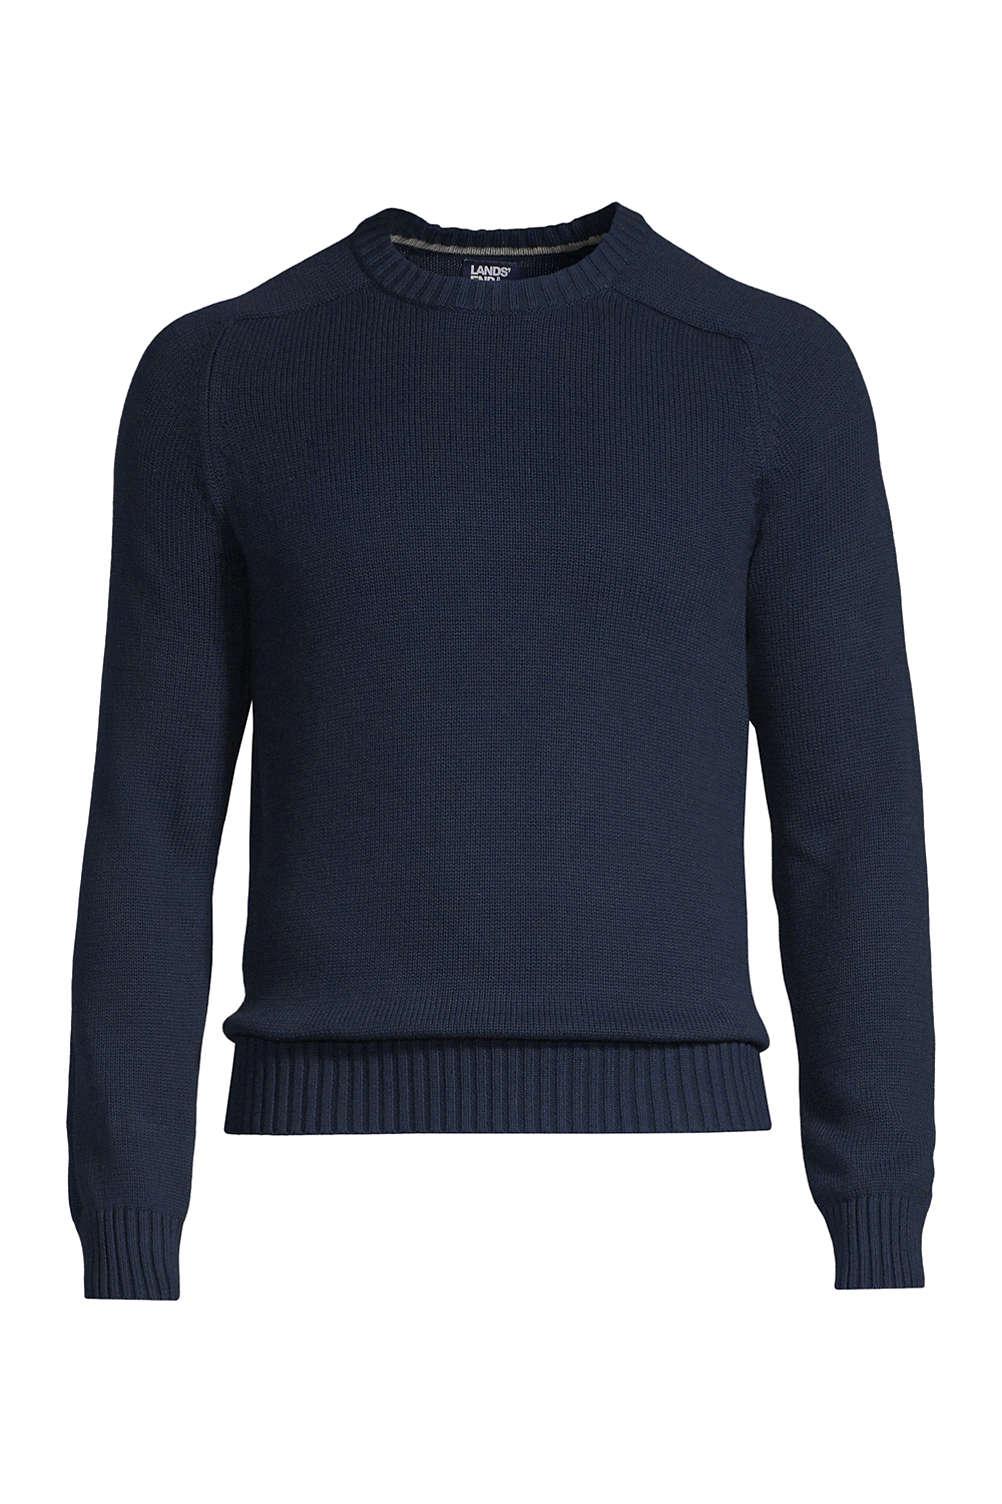 727b099af81f Men s Drifter Cotton Crew Sweater from Lands  End